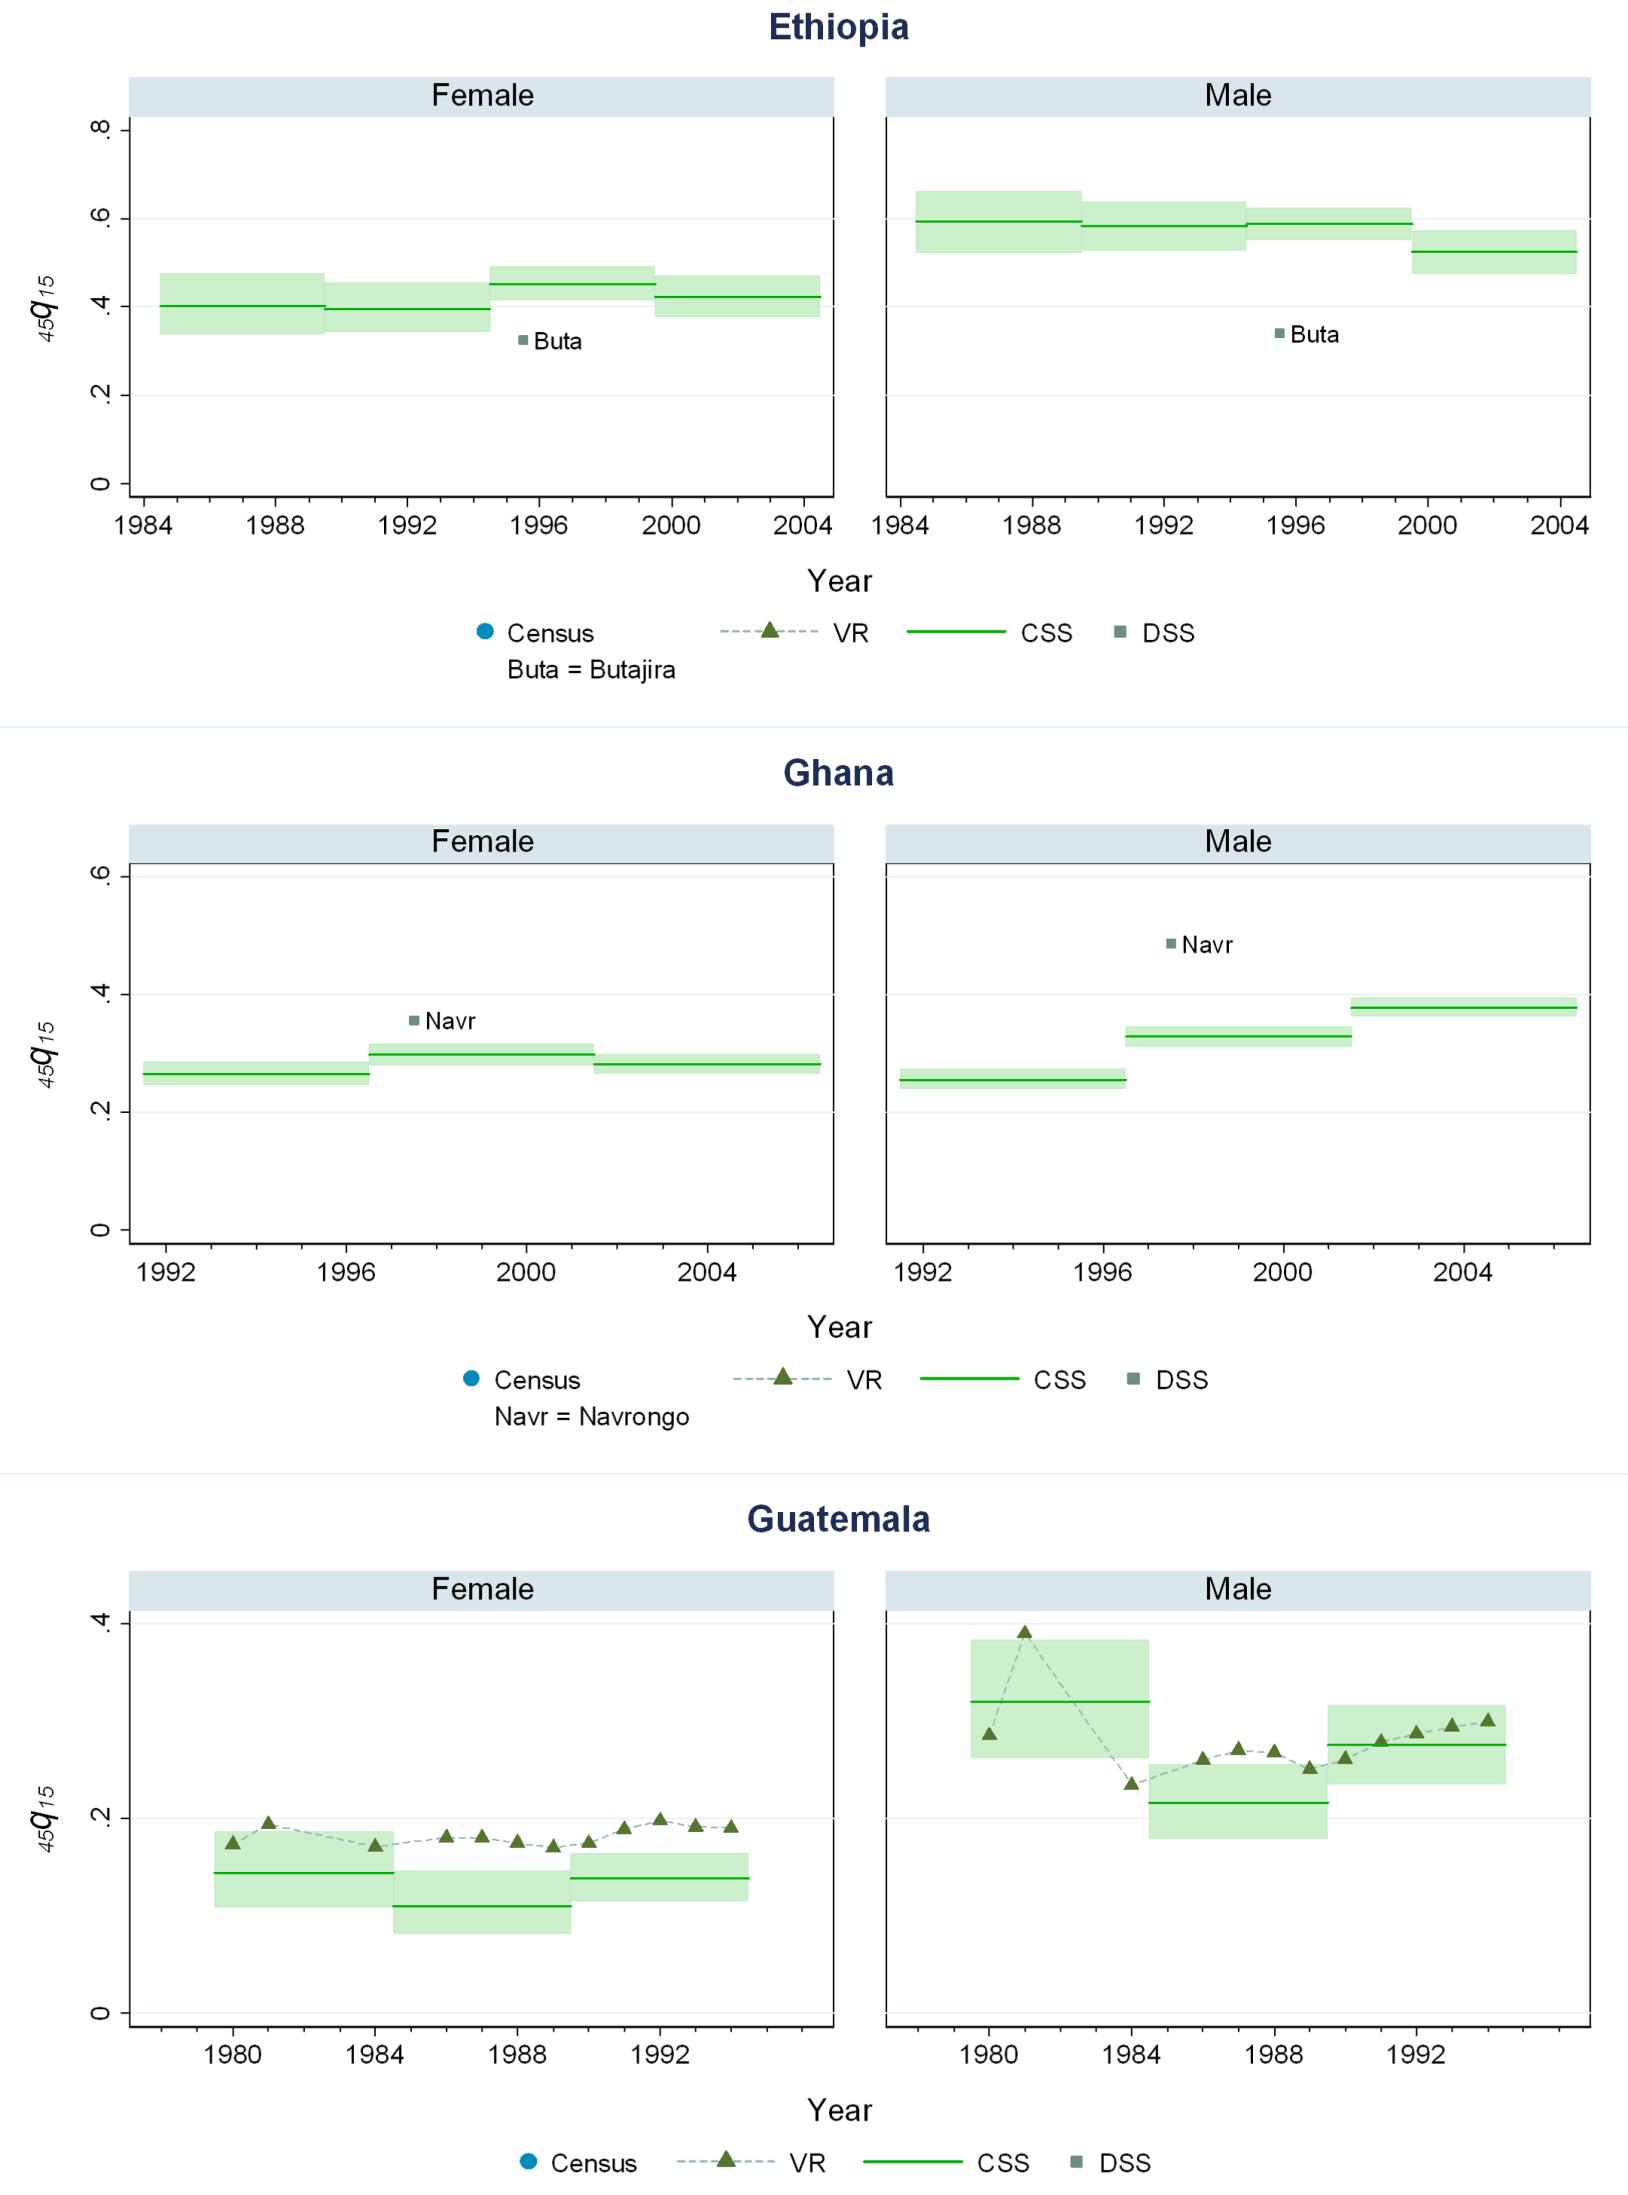 Estimates of <sub>45</sub><i>q</i><sub>15</sub> from the CSS method compared to estimates generated from vital registration, DSS, and census household death estimates: Ethiopia, Ghana, Guatemala.